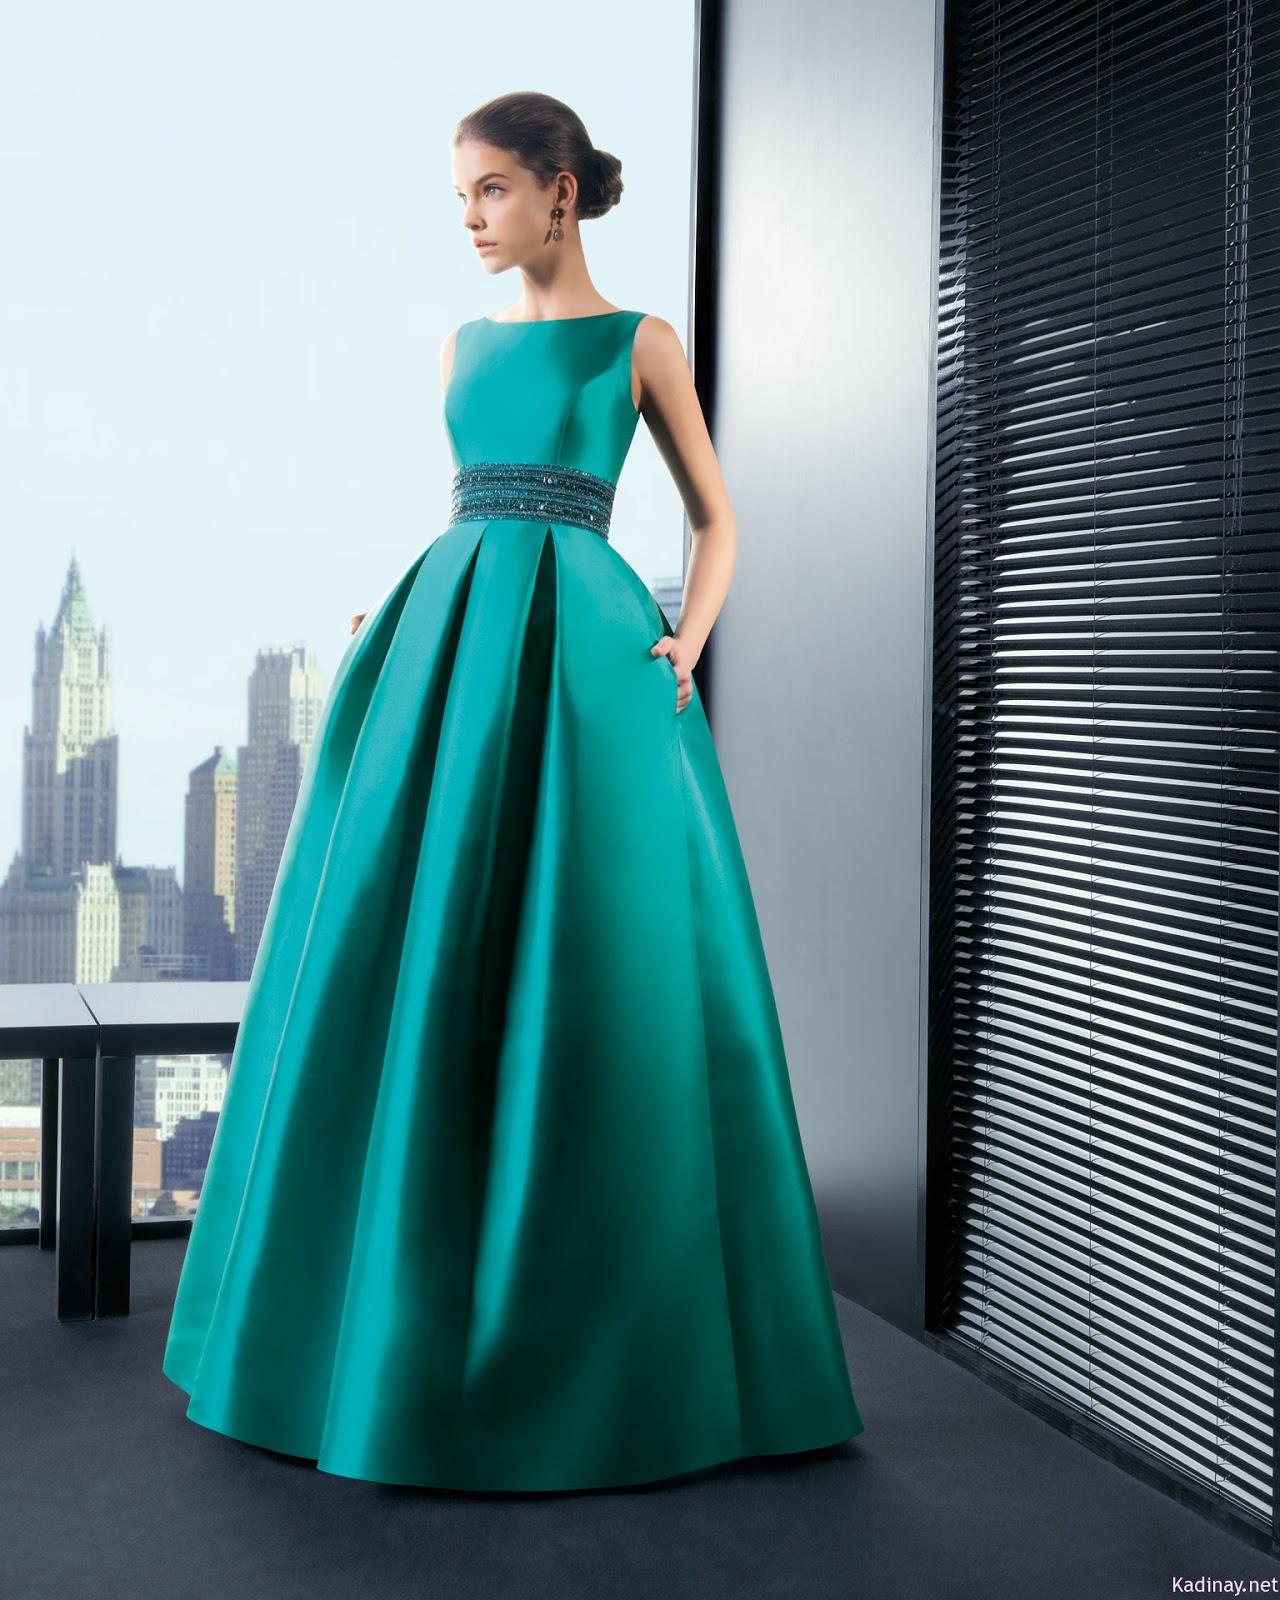 2013 Rengarenk Bayan Abiye Elbise Modelleri